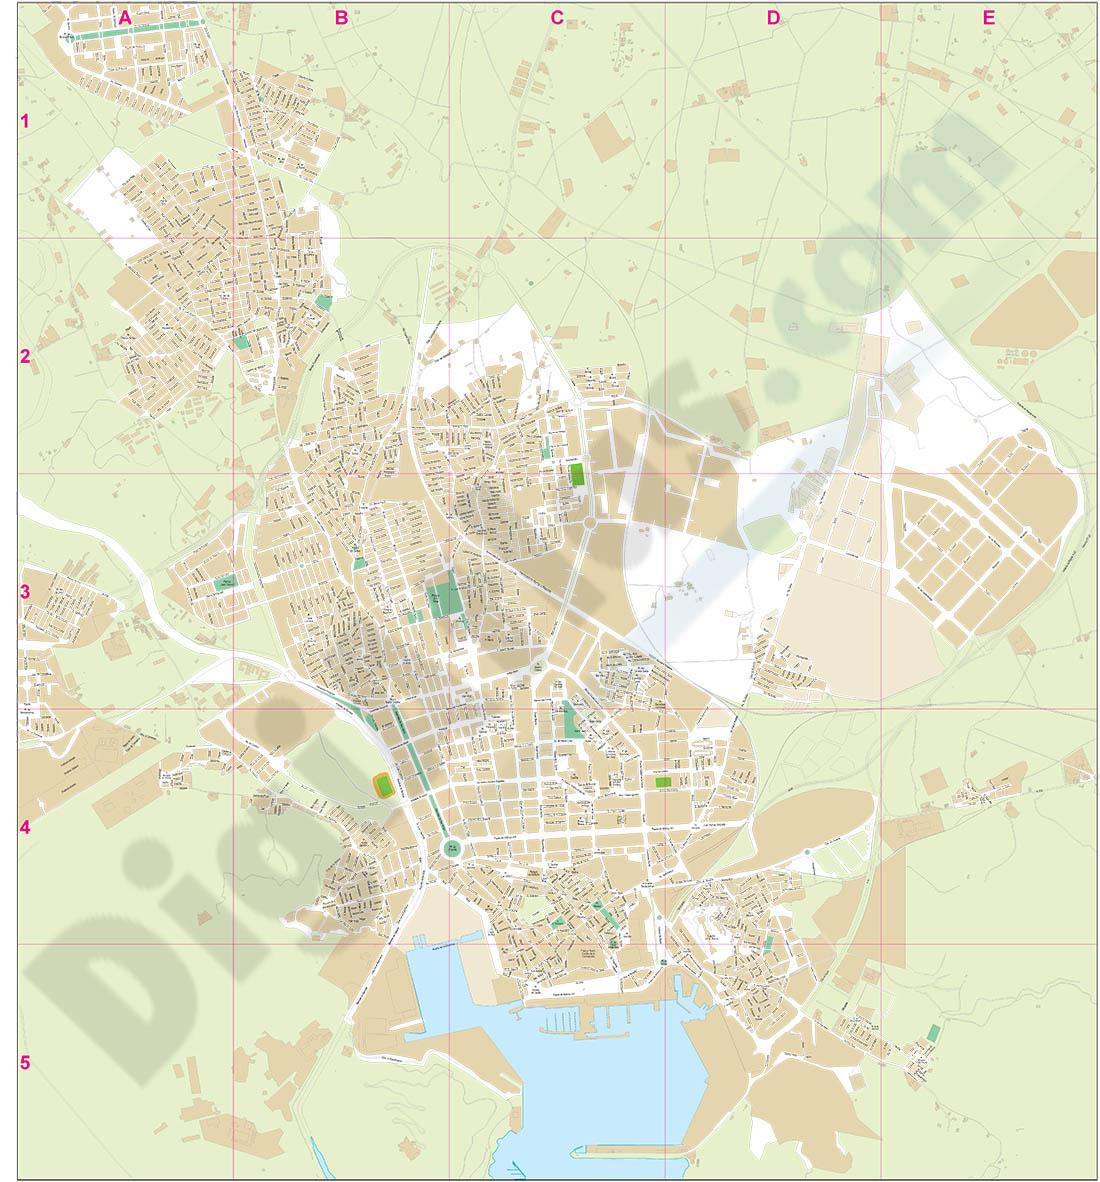 Cartagena - city map